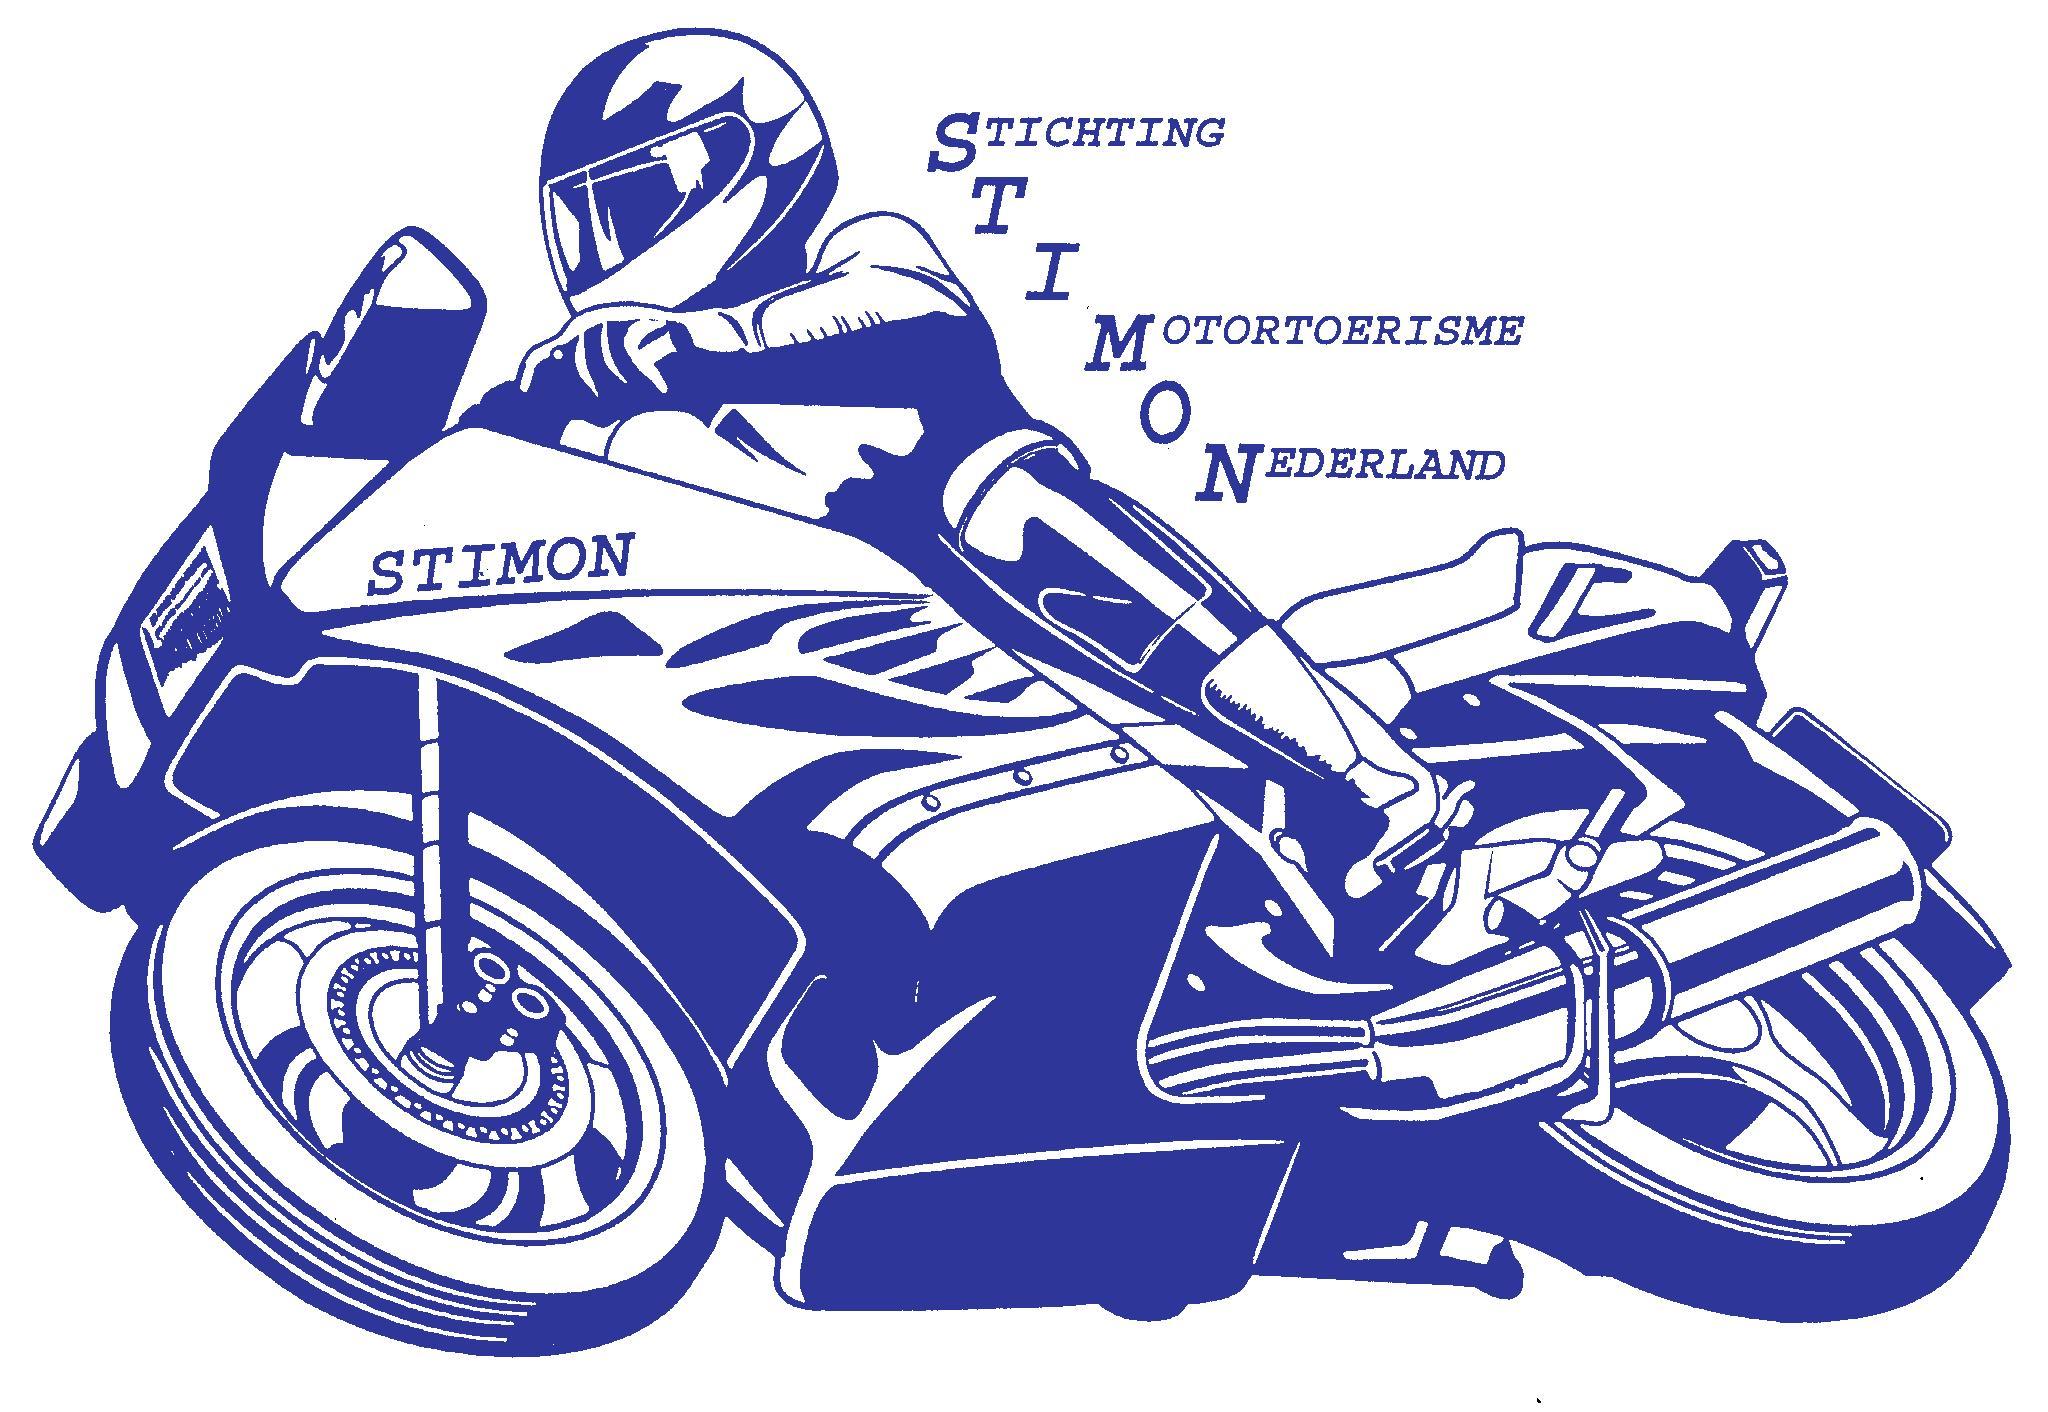 STIchting MOtortoerisme Nederland